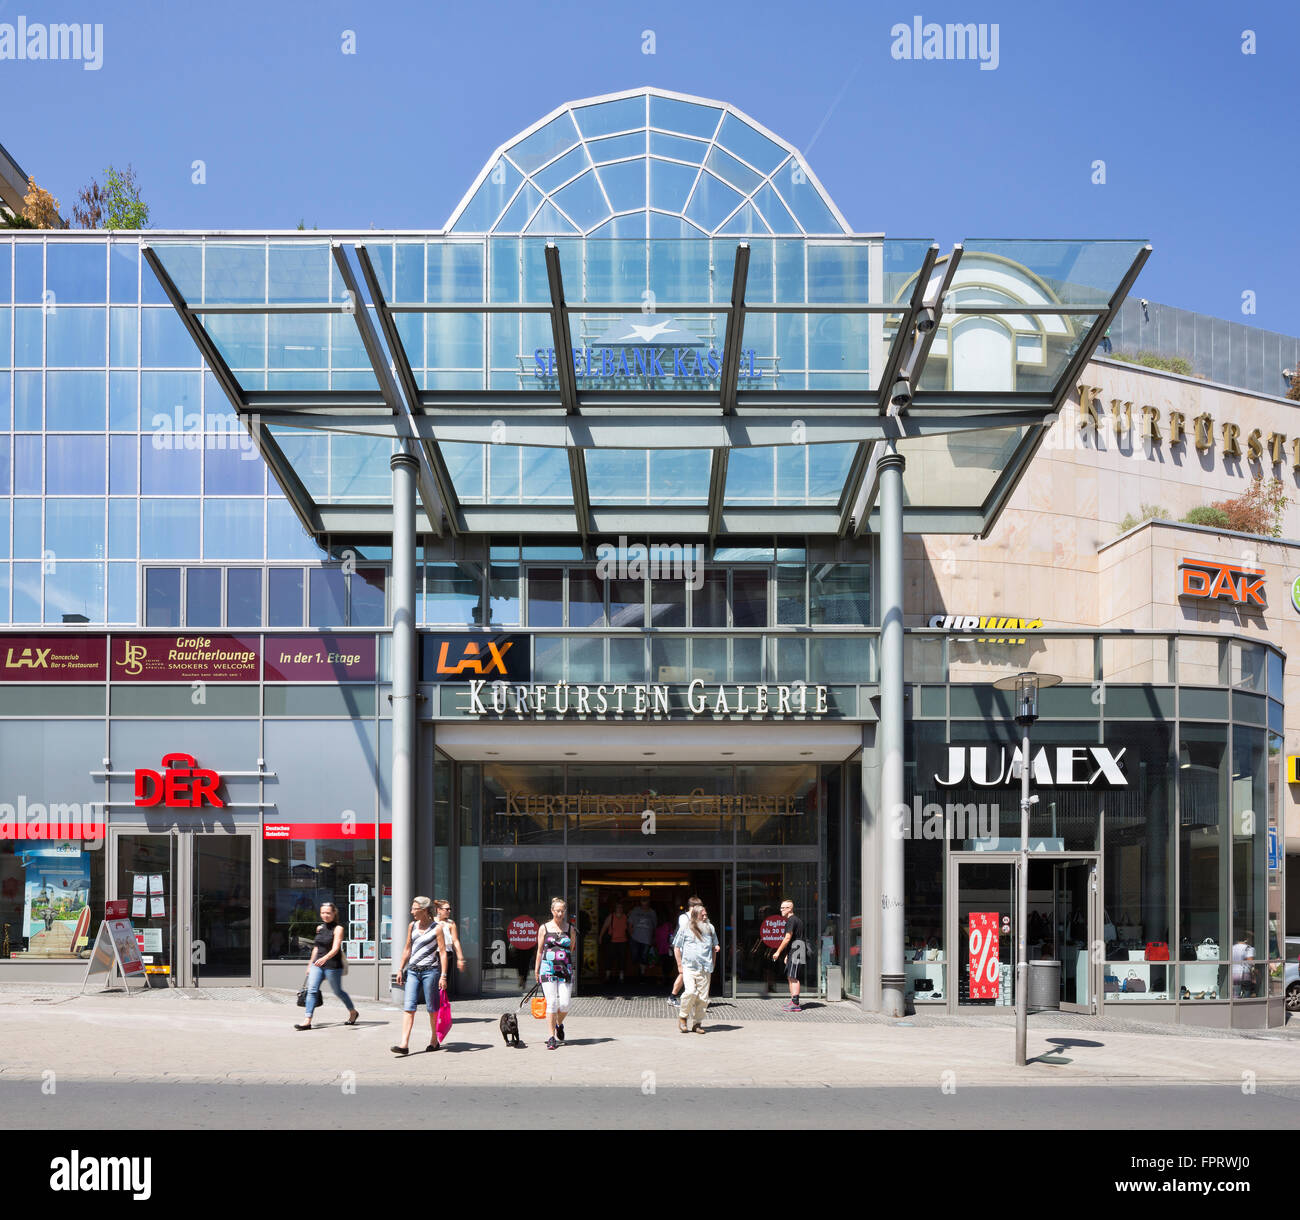 Casino Kassel Kurfürsten Galerie